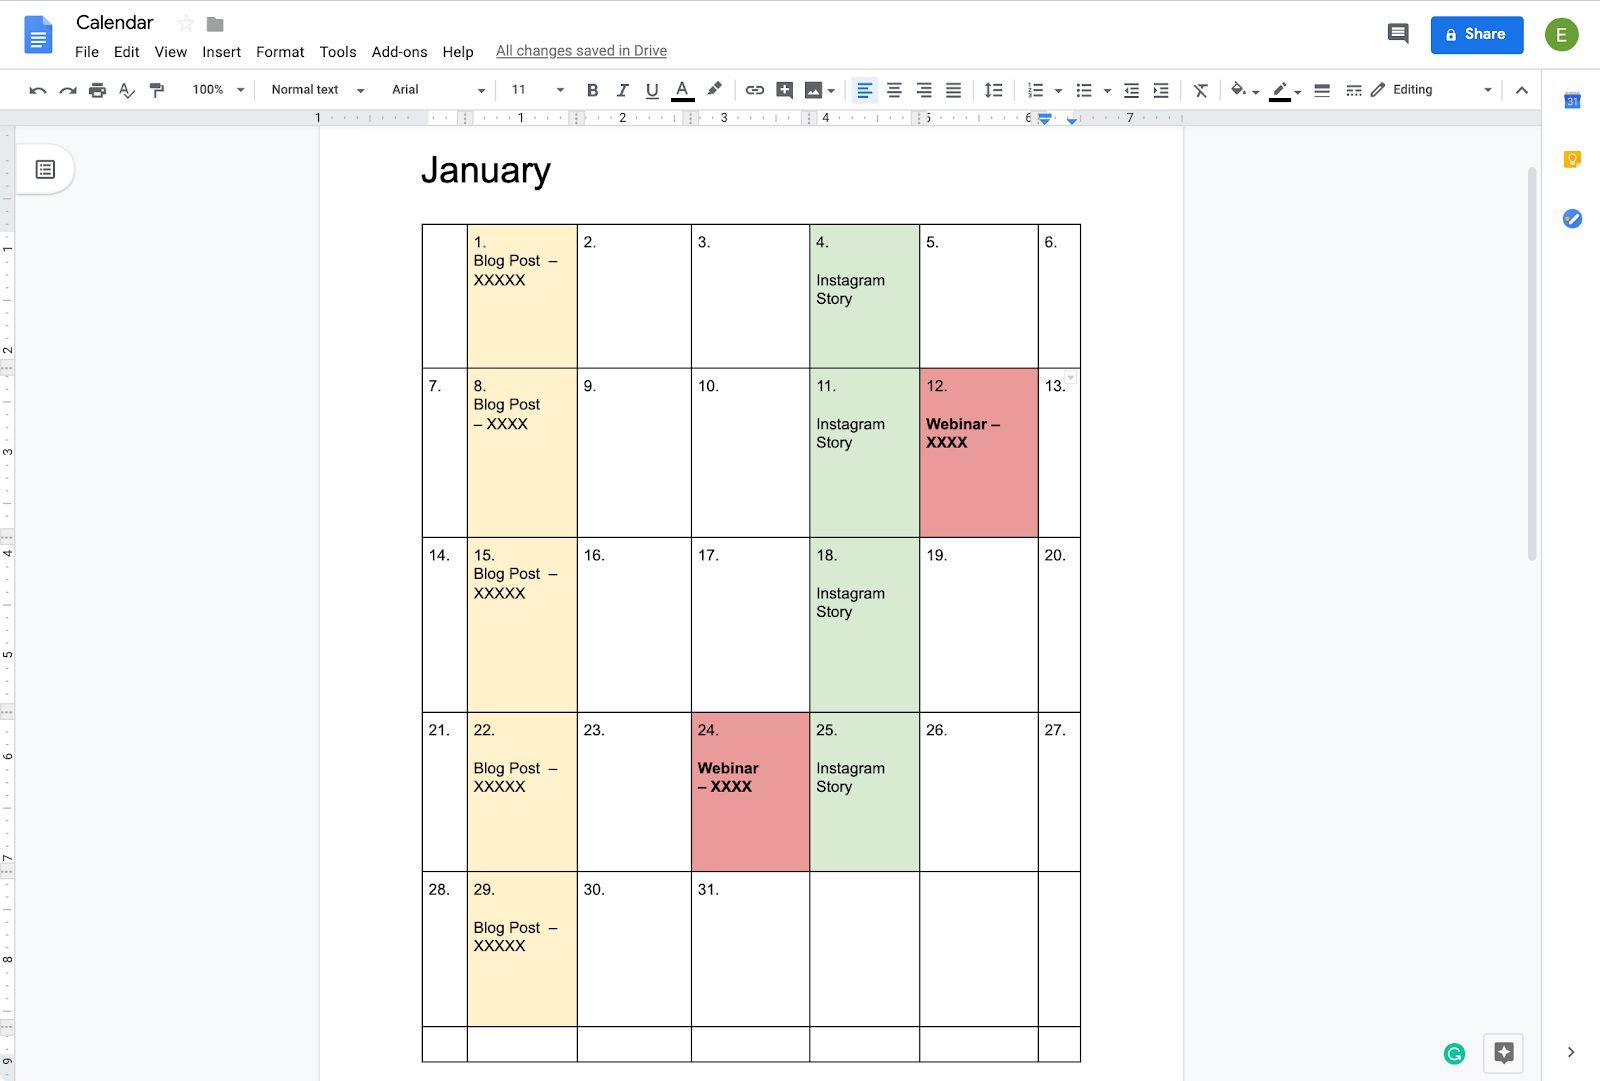 001 Imposing Calendar Template Google Doc High Definition  Docs Editable Two Week 2019-20Full